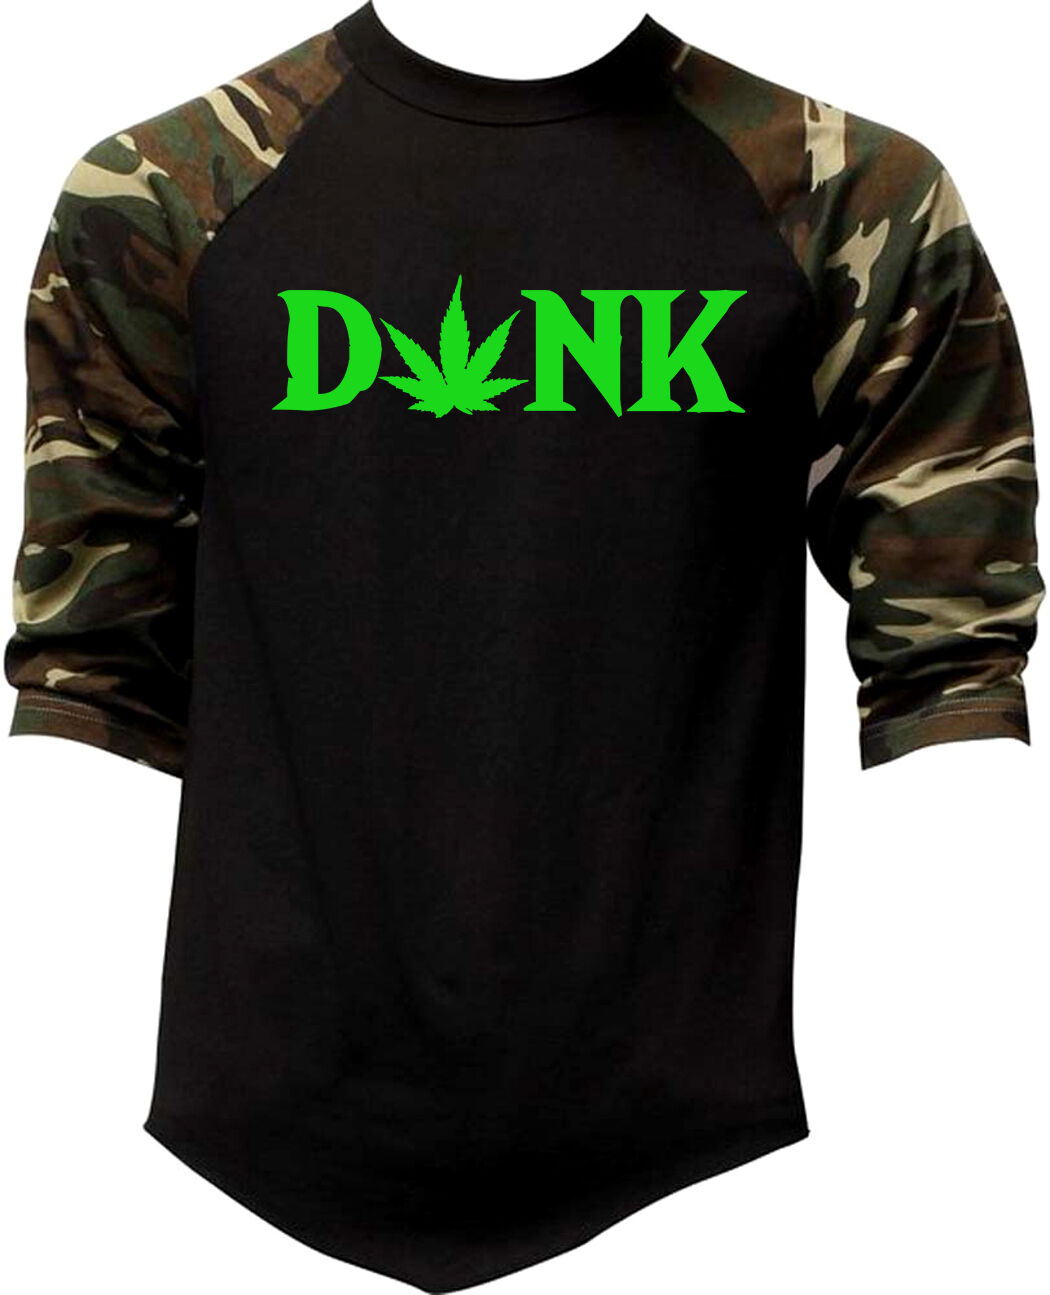 New Men's Dank Weed Leaf Camo Baseball Raglan T Shirt Kush 420 Blunt Cali V359 1